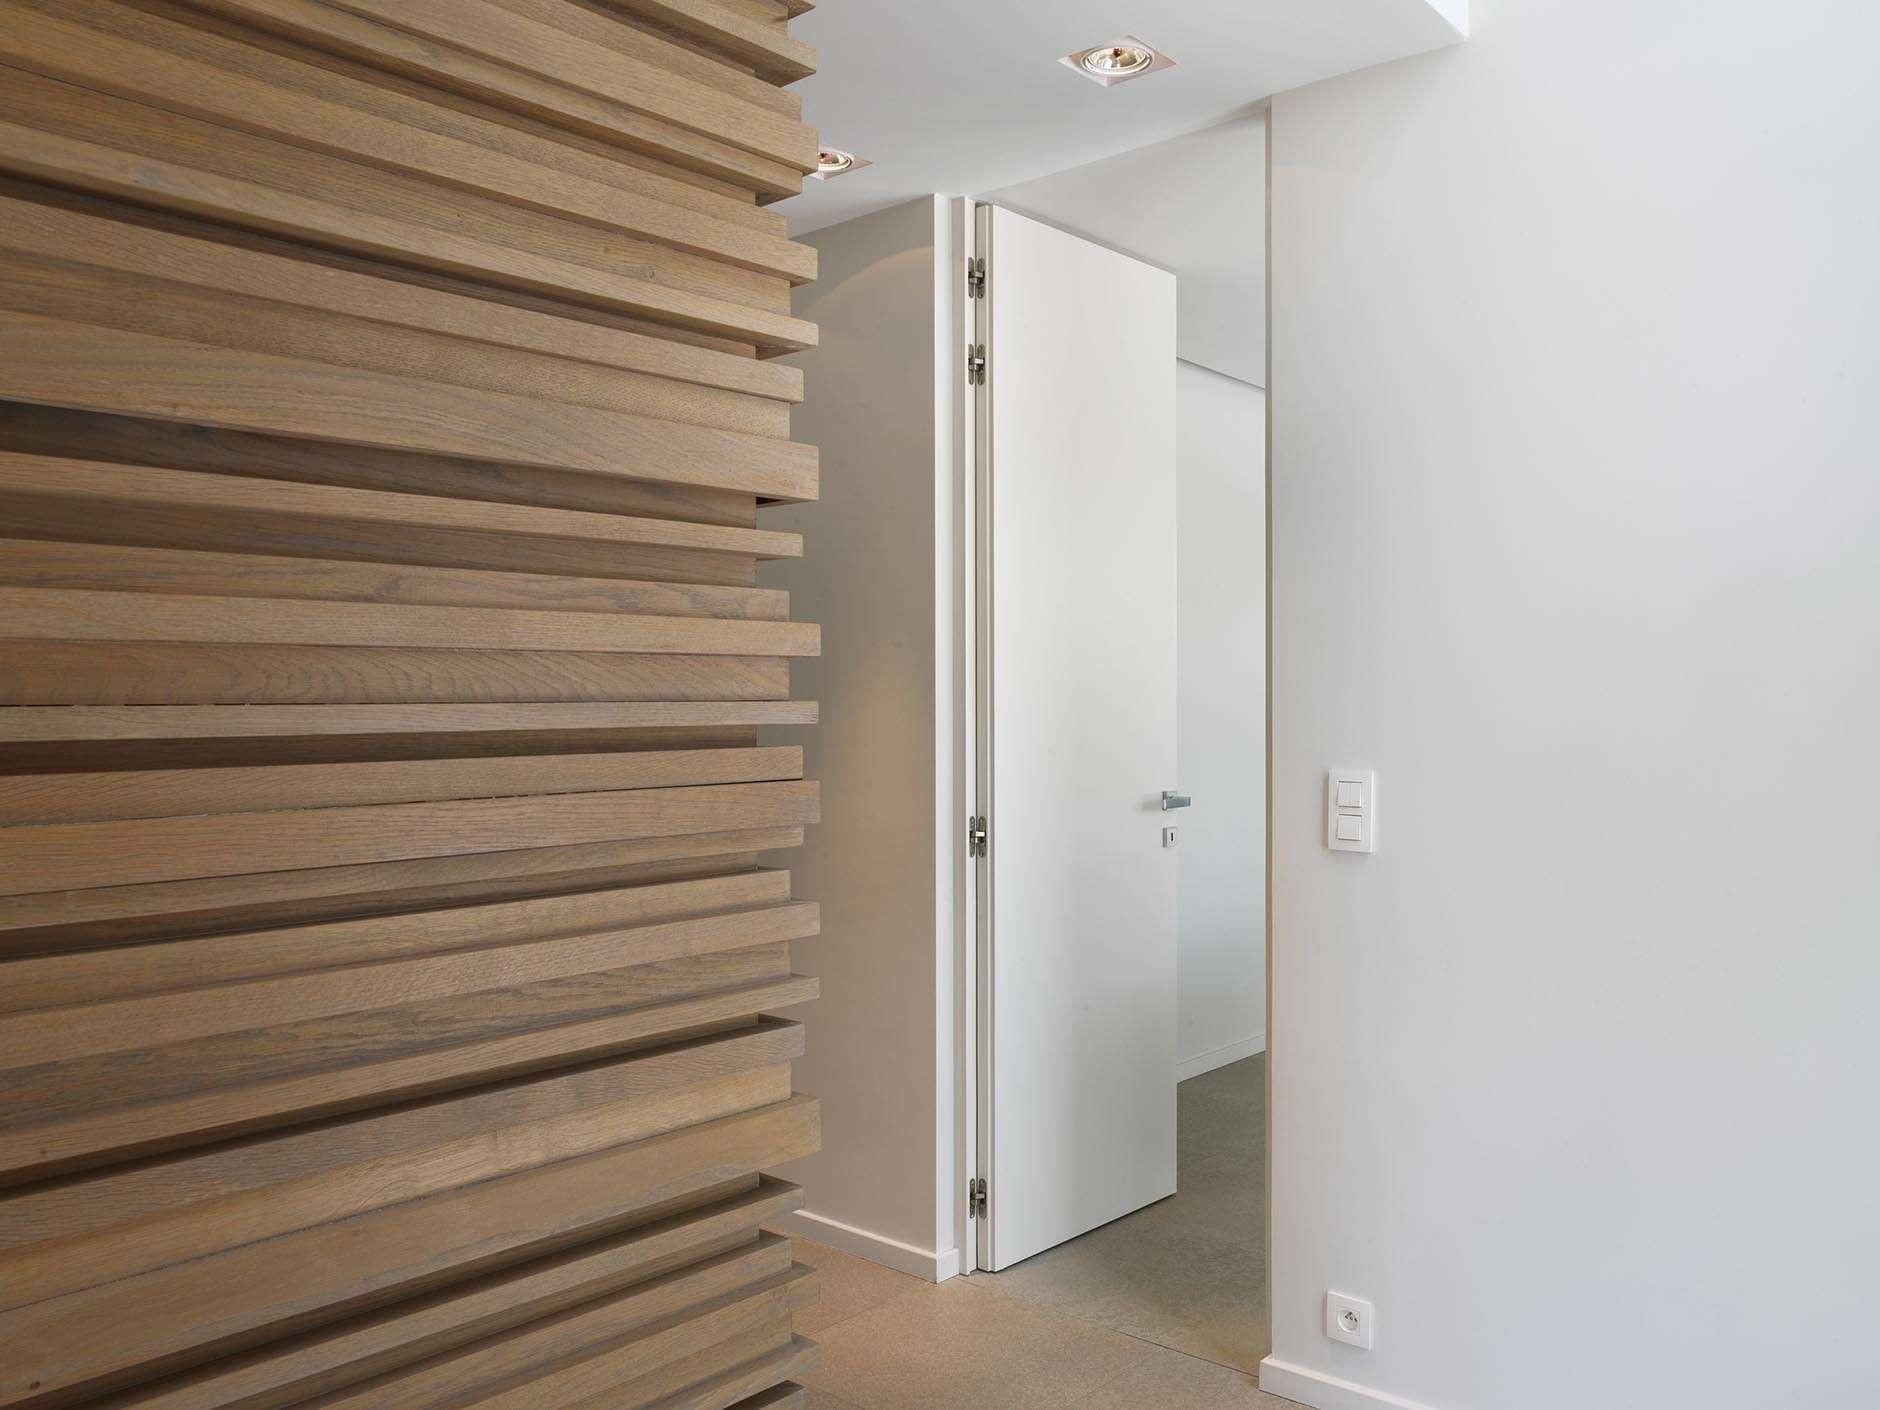 plafondhoge-wit-gelakte-deur-blokkader